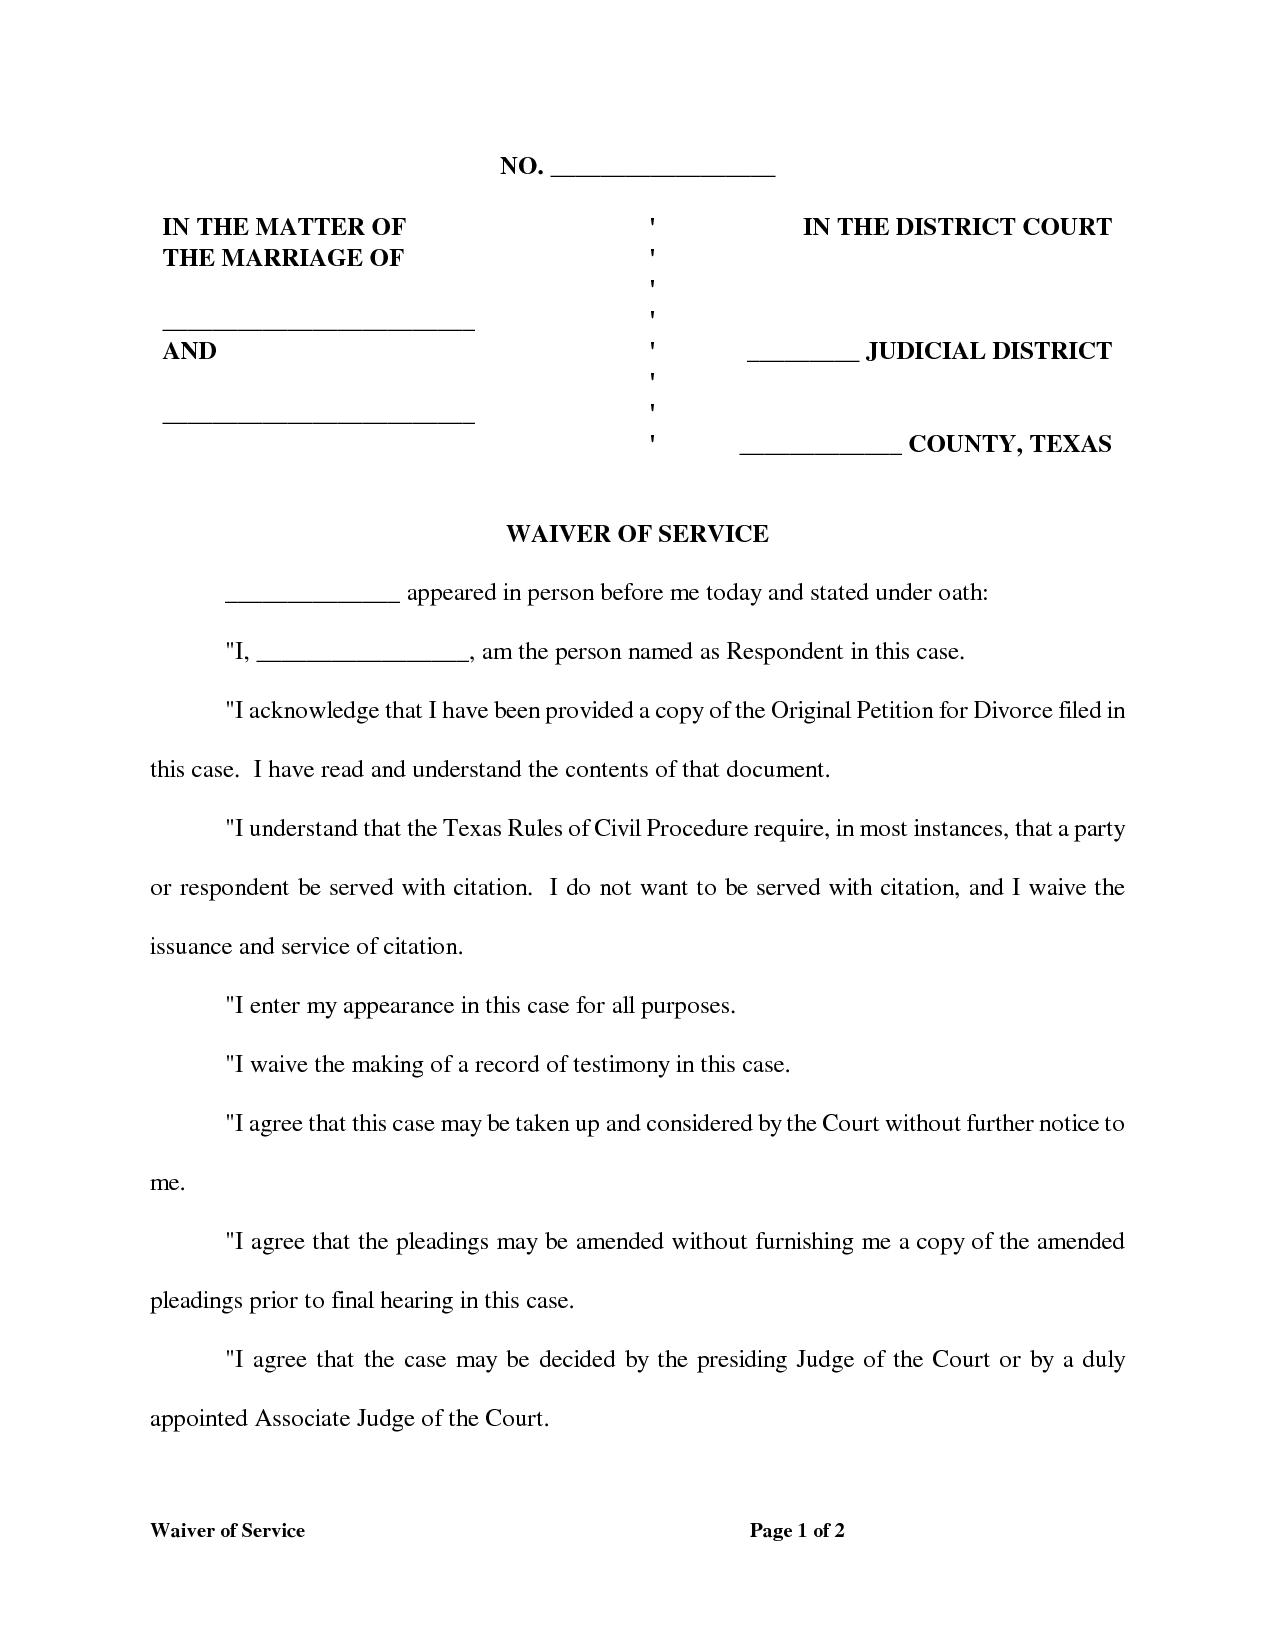 Family Law Morris Texas Law